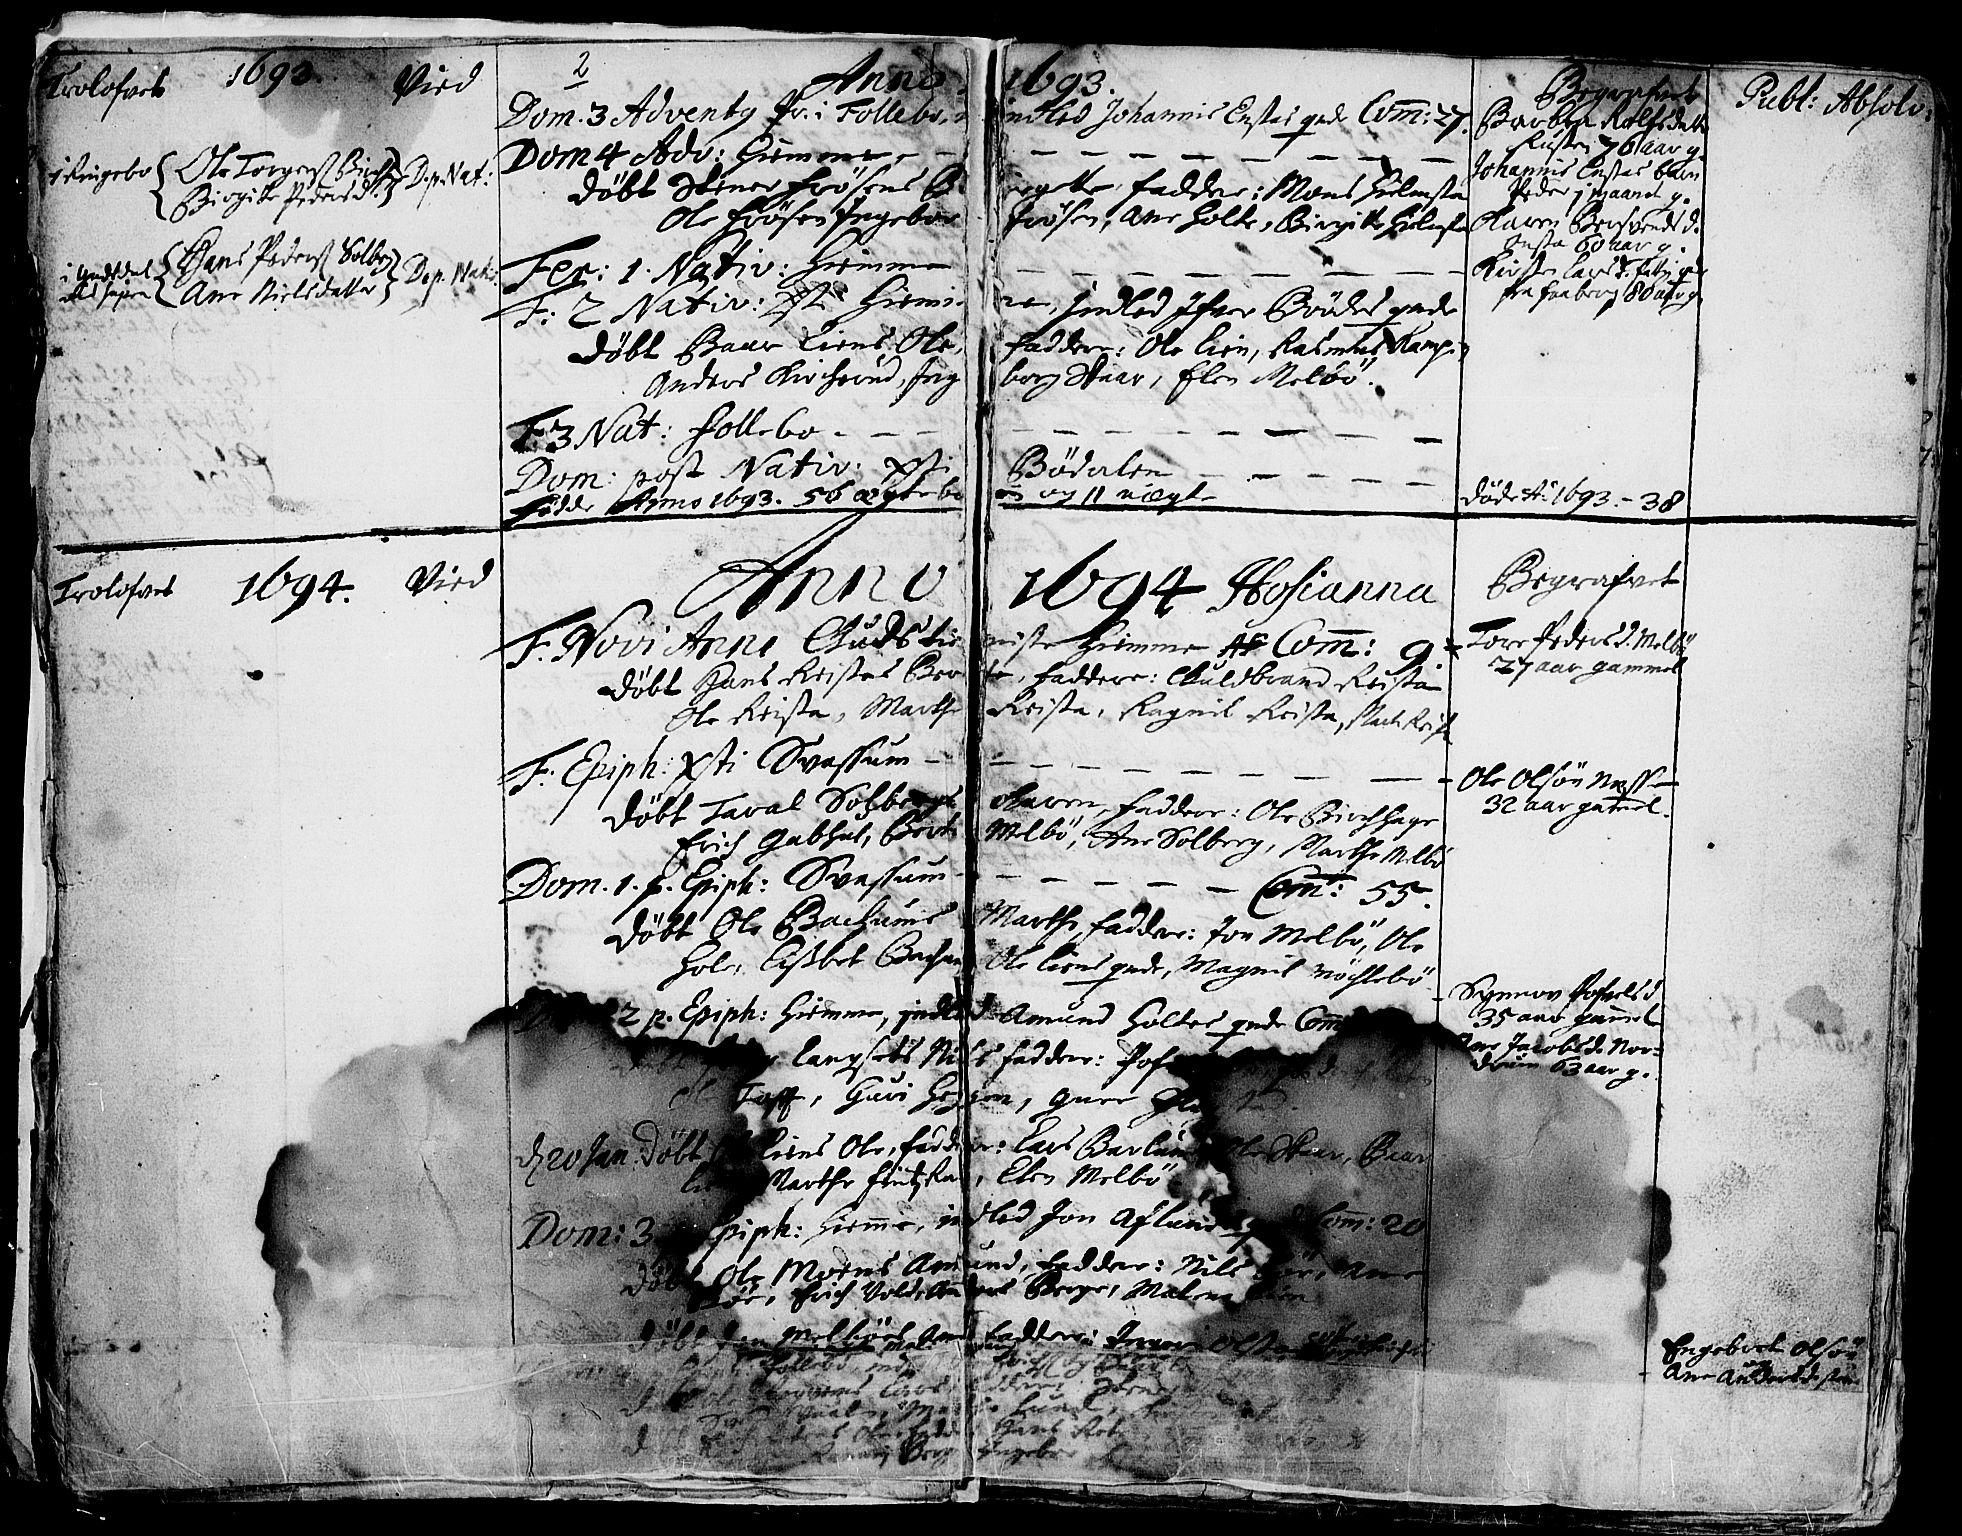 SAH, Gausdal prestekontor, Ministerialbok nr. 1, 1693-1728, s. 2